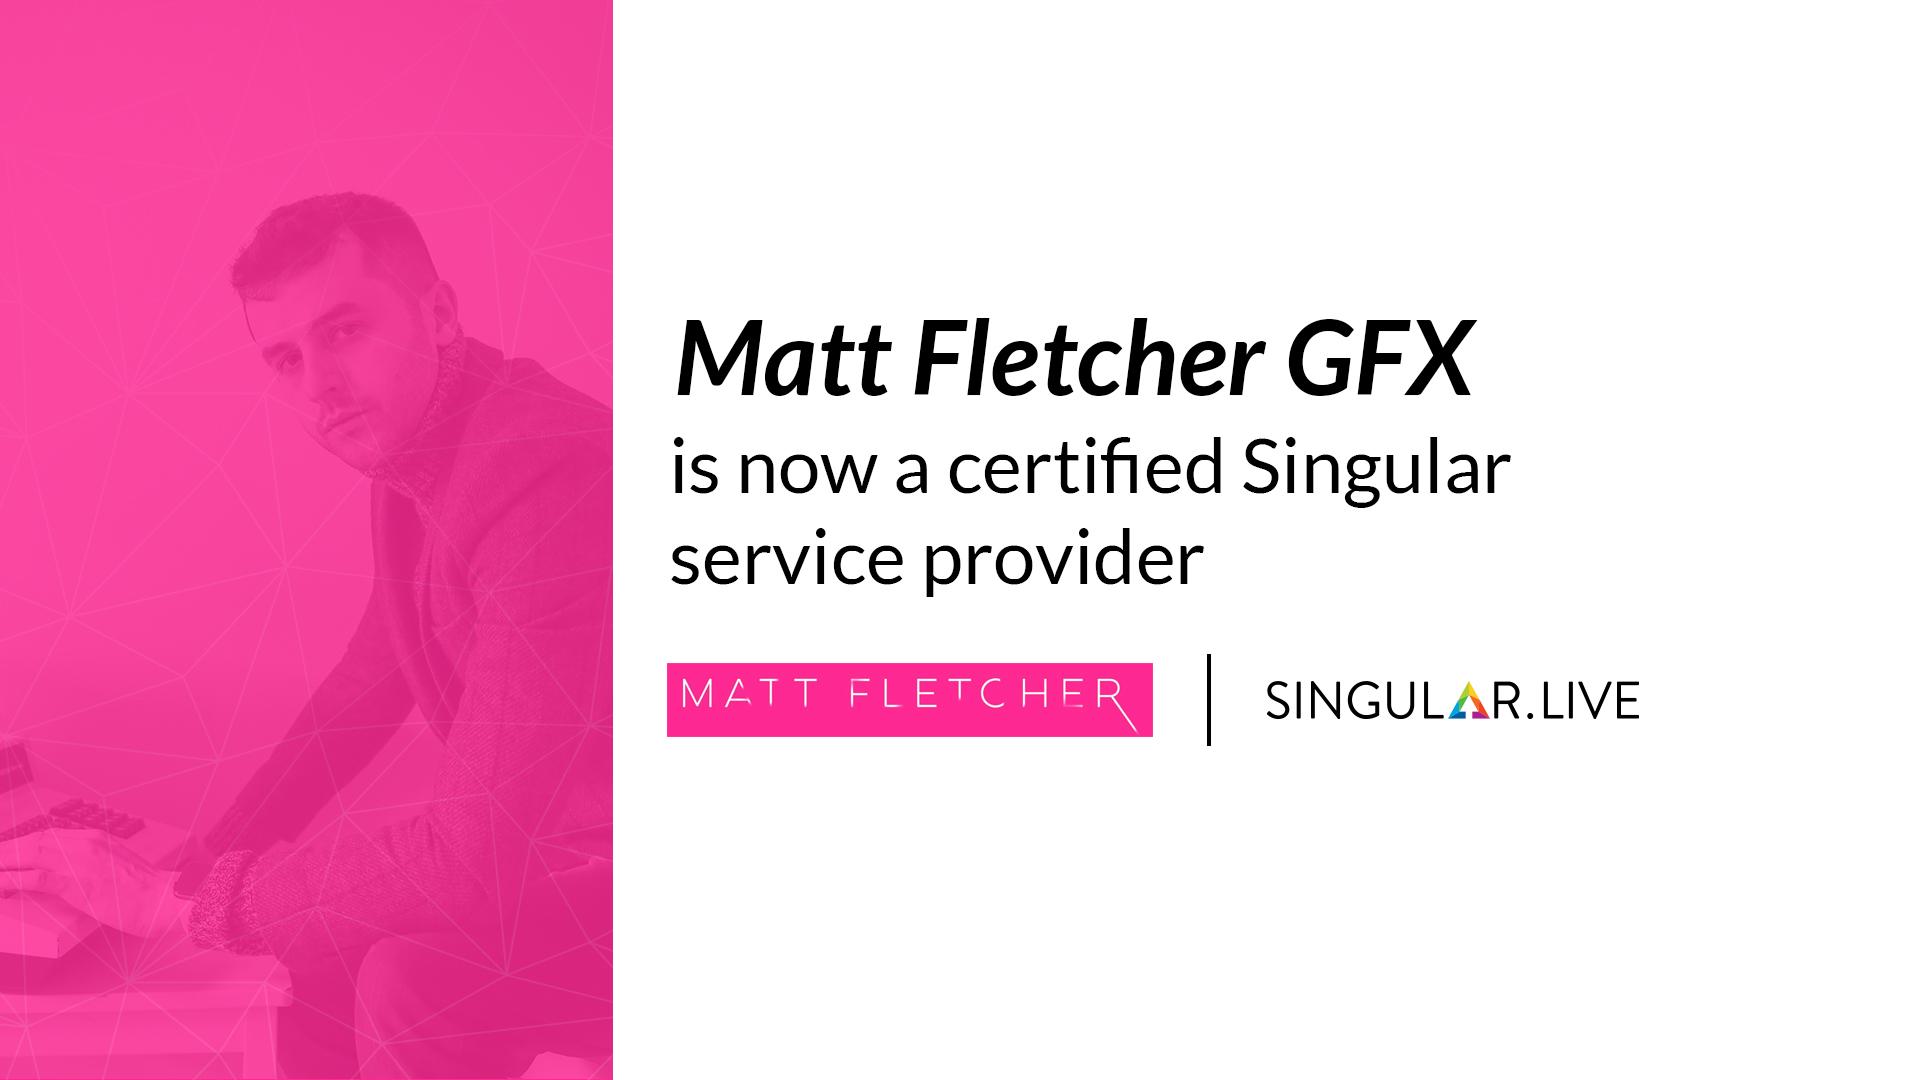 Matt Fletcher GFX joins Singular Partner Program